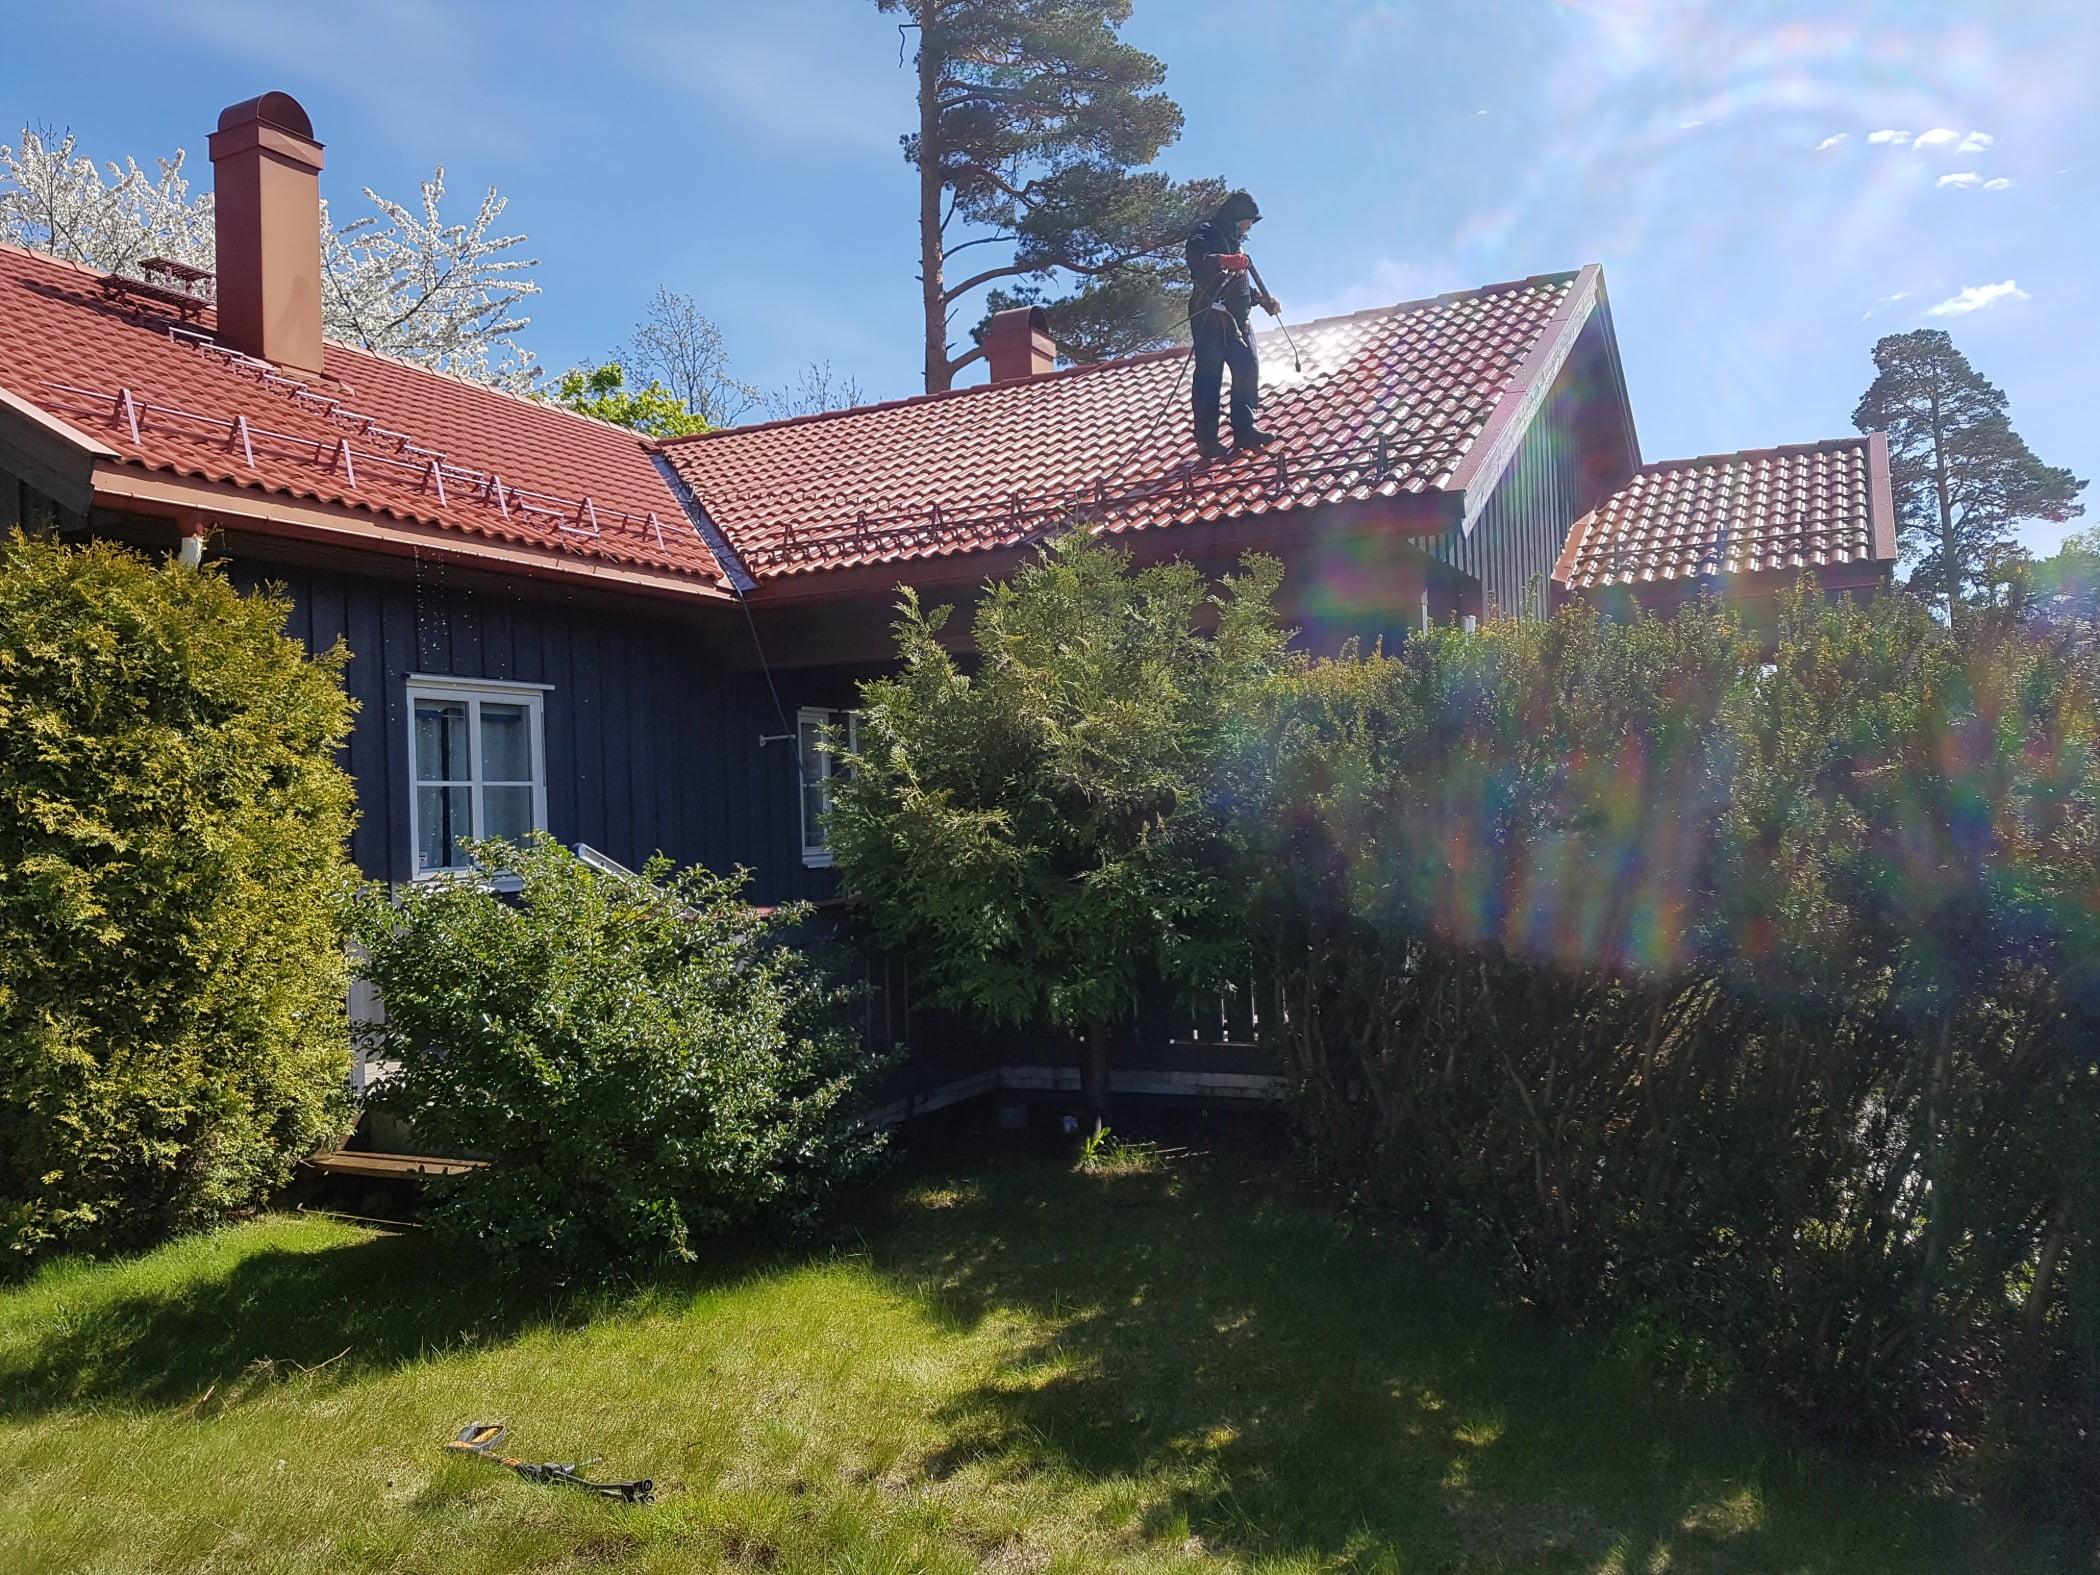 Land lot, Cloud, Plant, Sky, Window, Building, House, Tree, Cottage, Biome